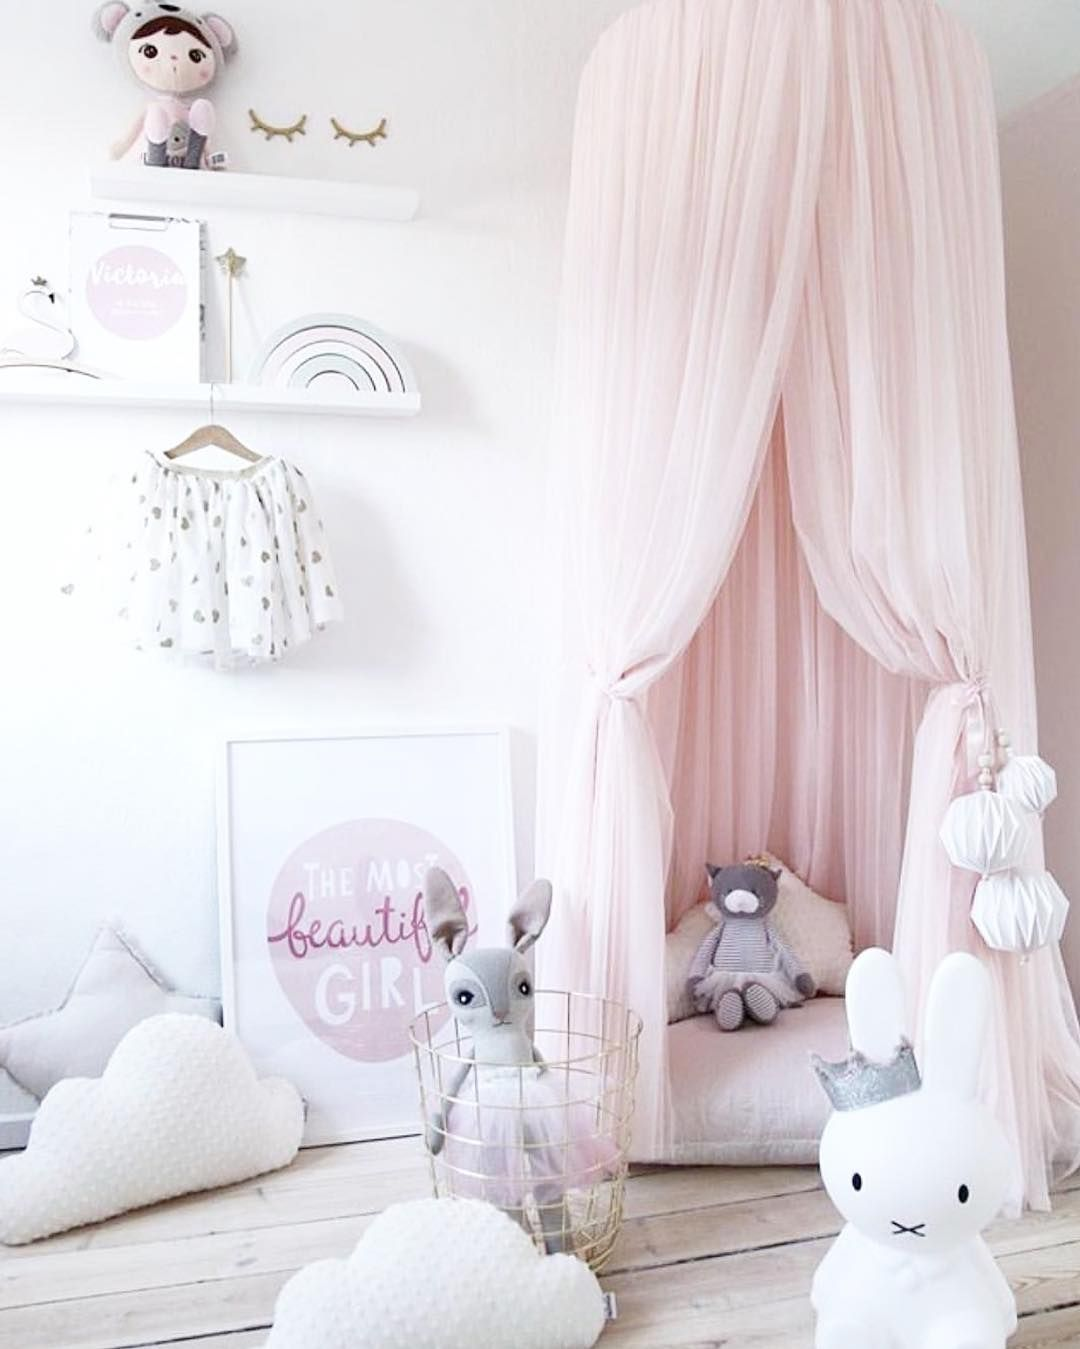 Kidroom Bild Von Kj Prinzessinnen Himmelbett Prinzessinnen Bett